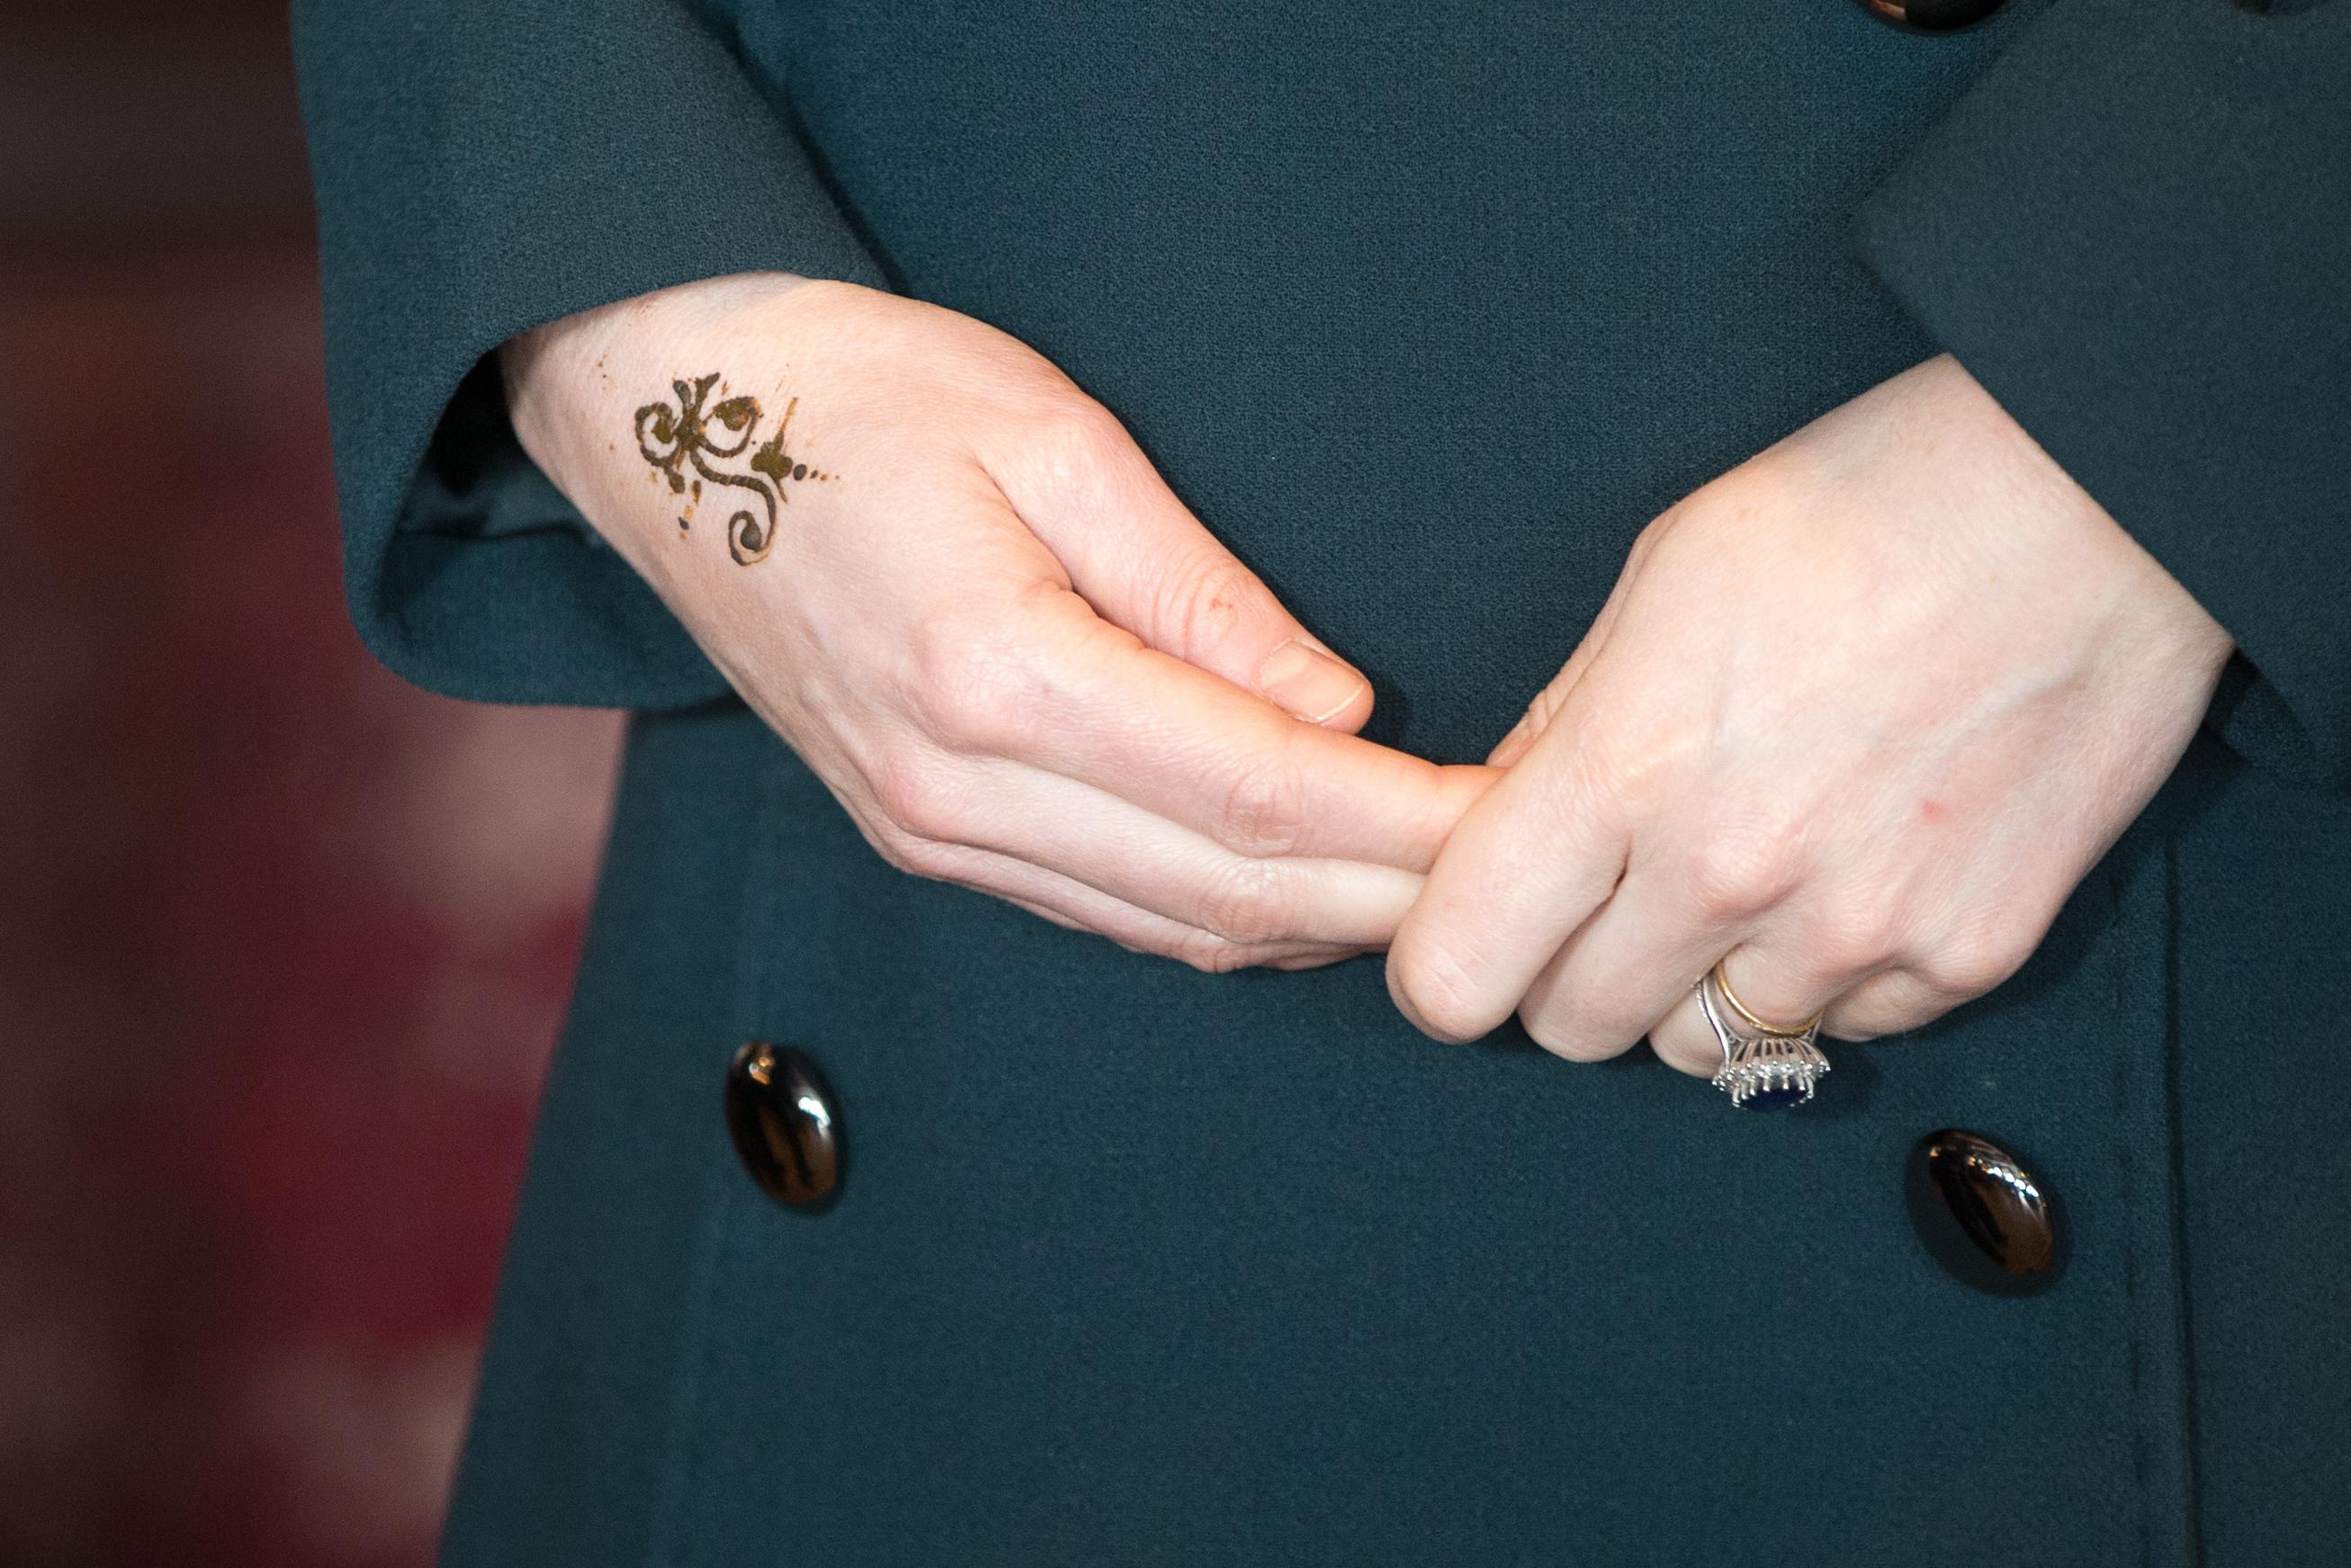 Kate Middleton tatuagem